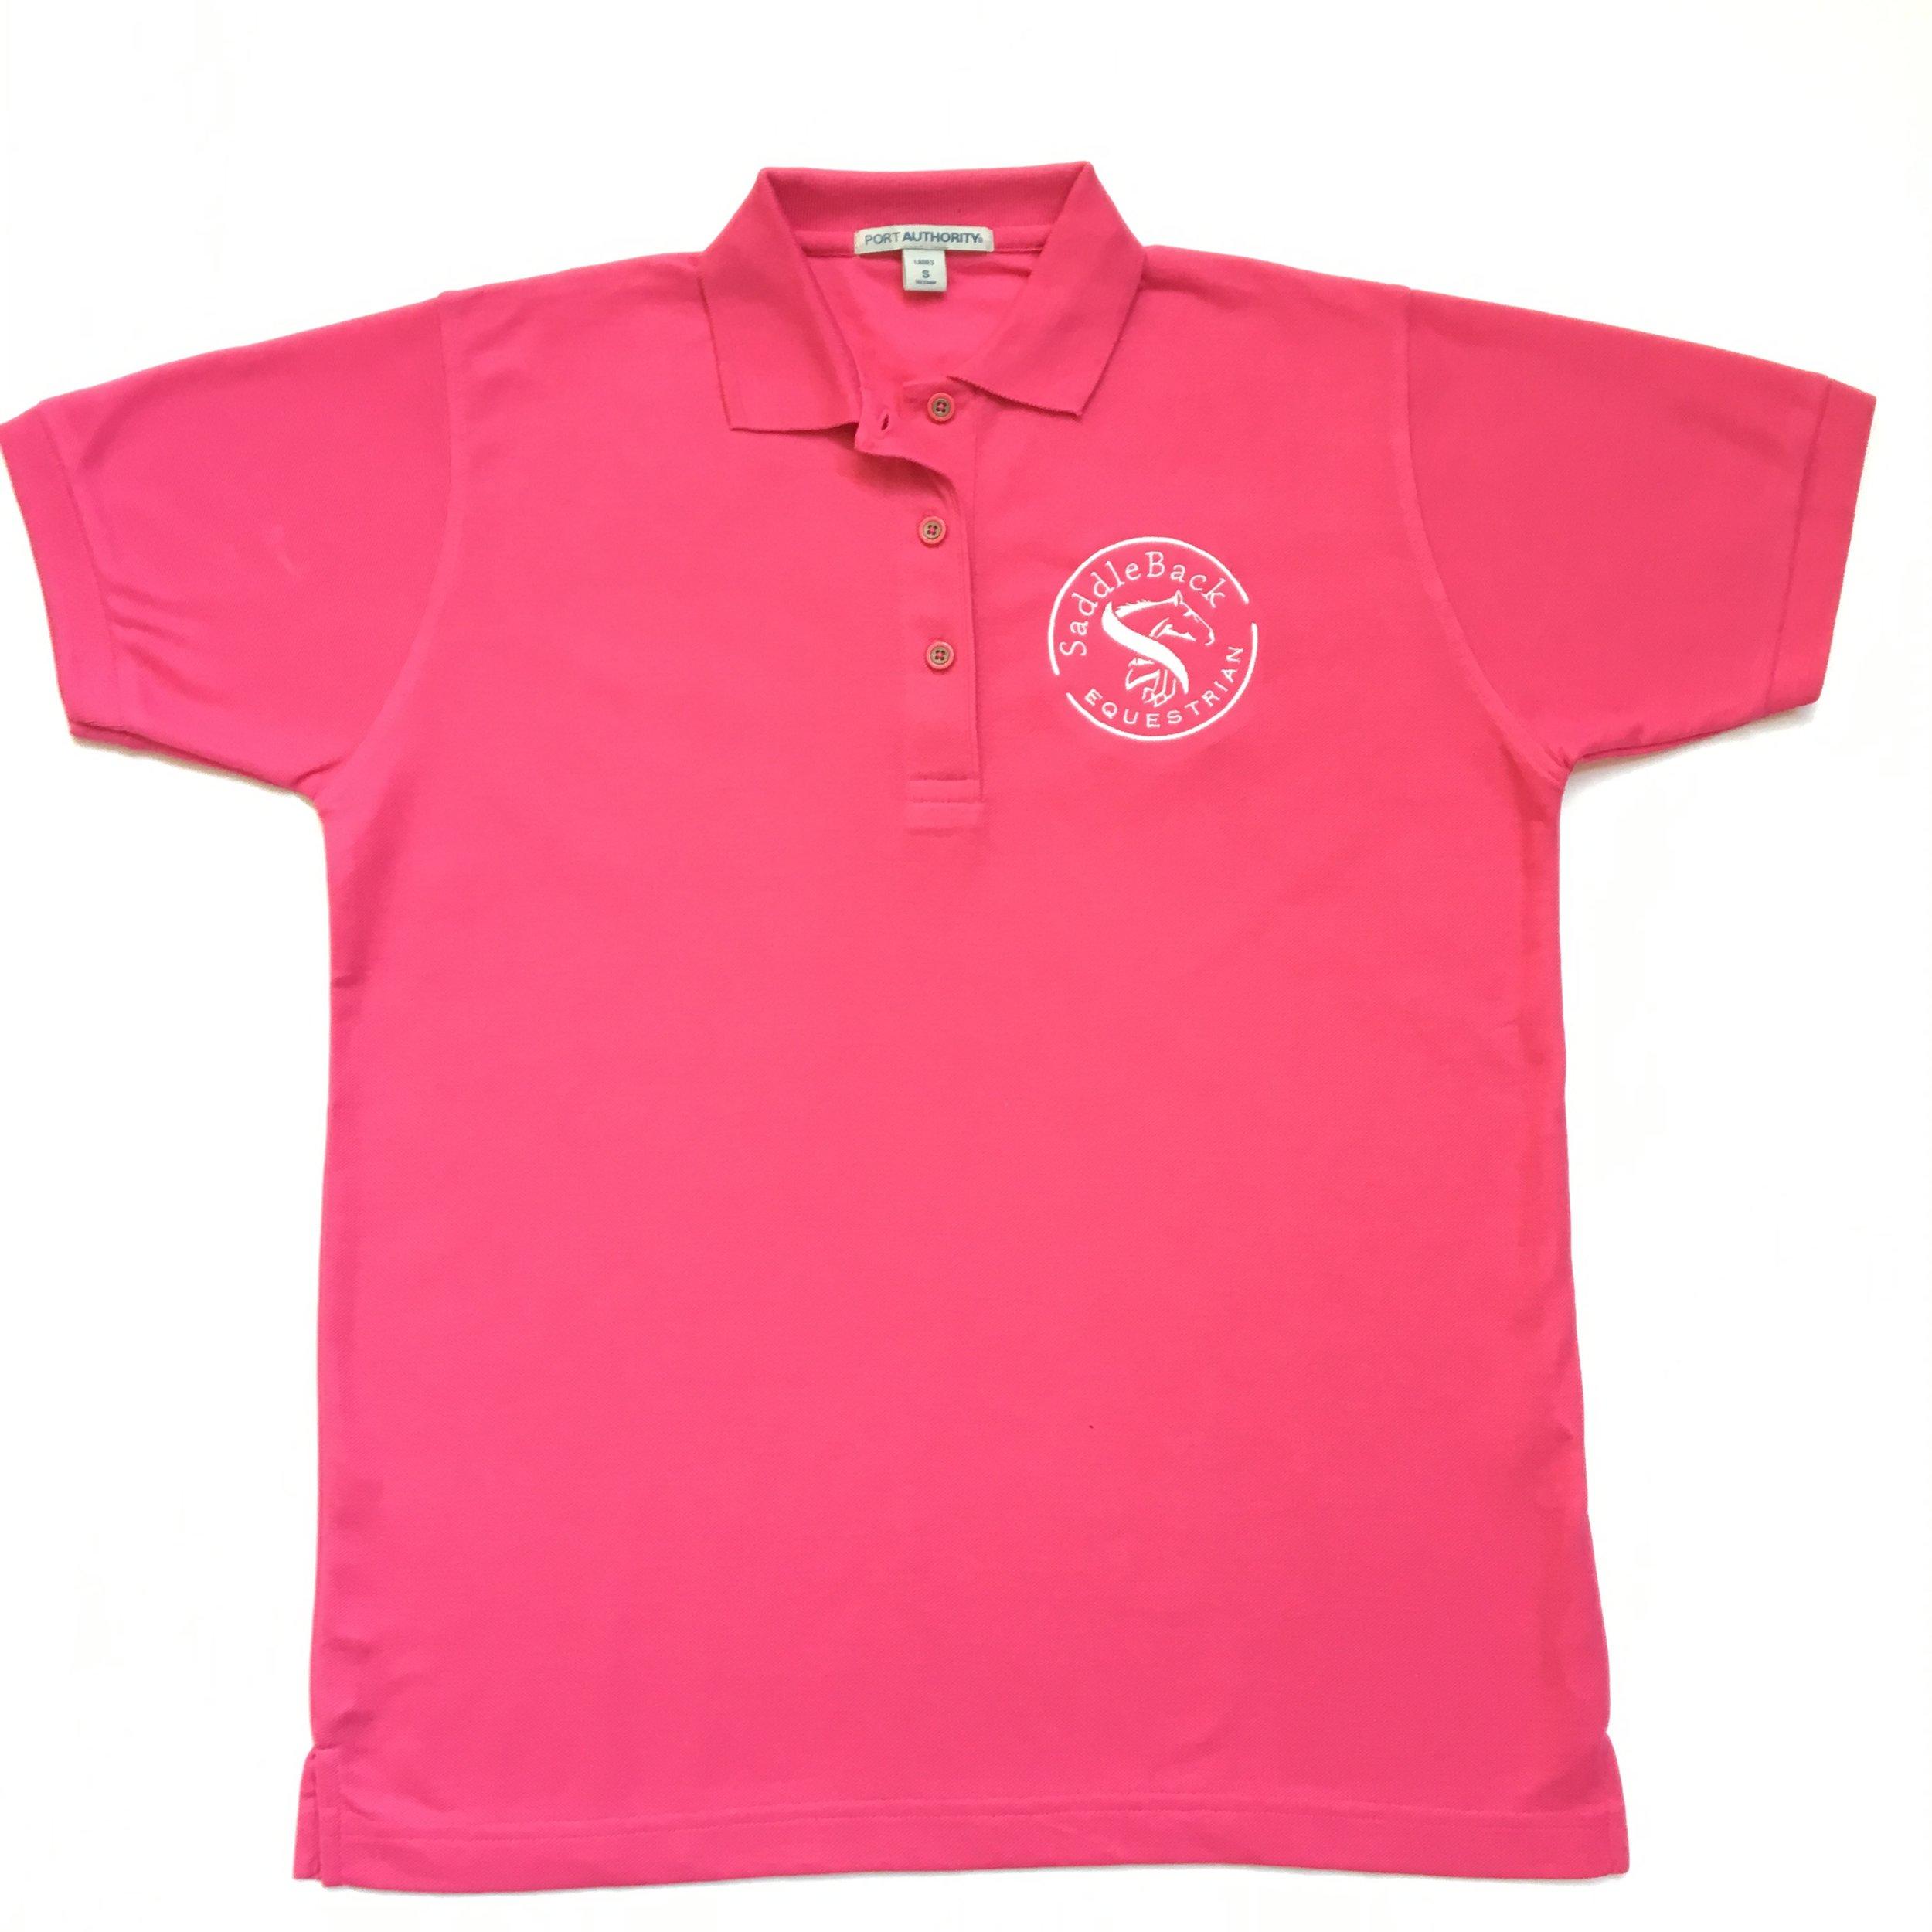 SBE Pink Polo.JPG